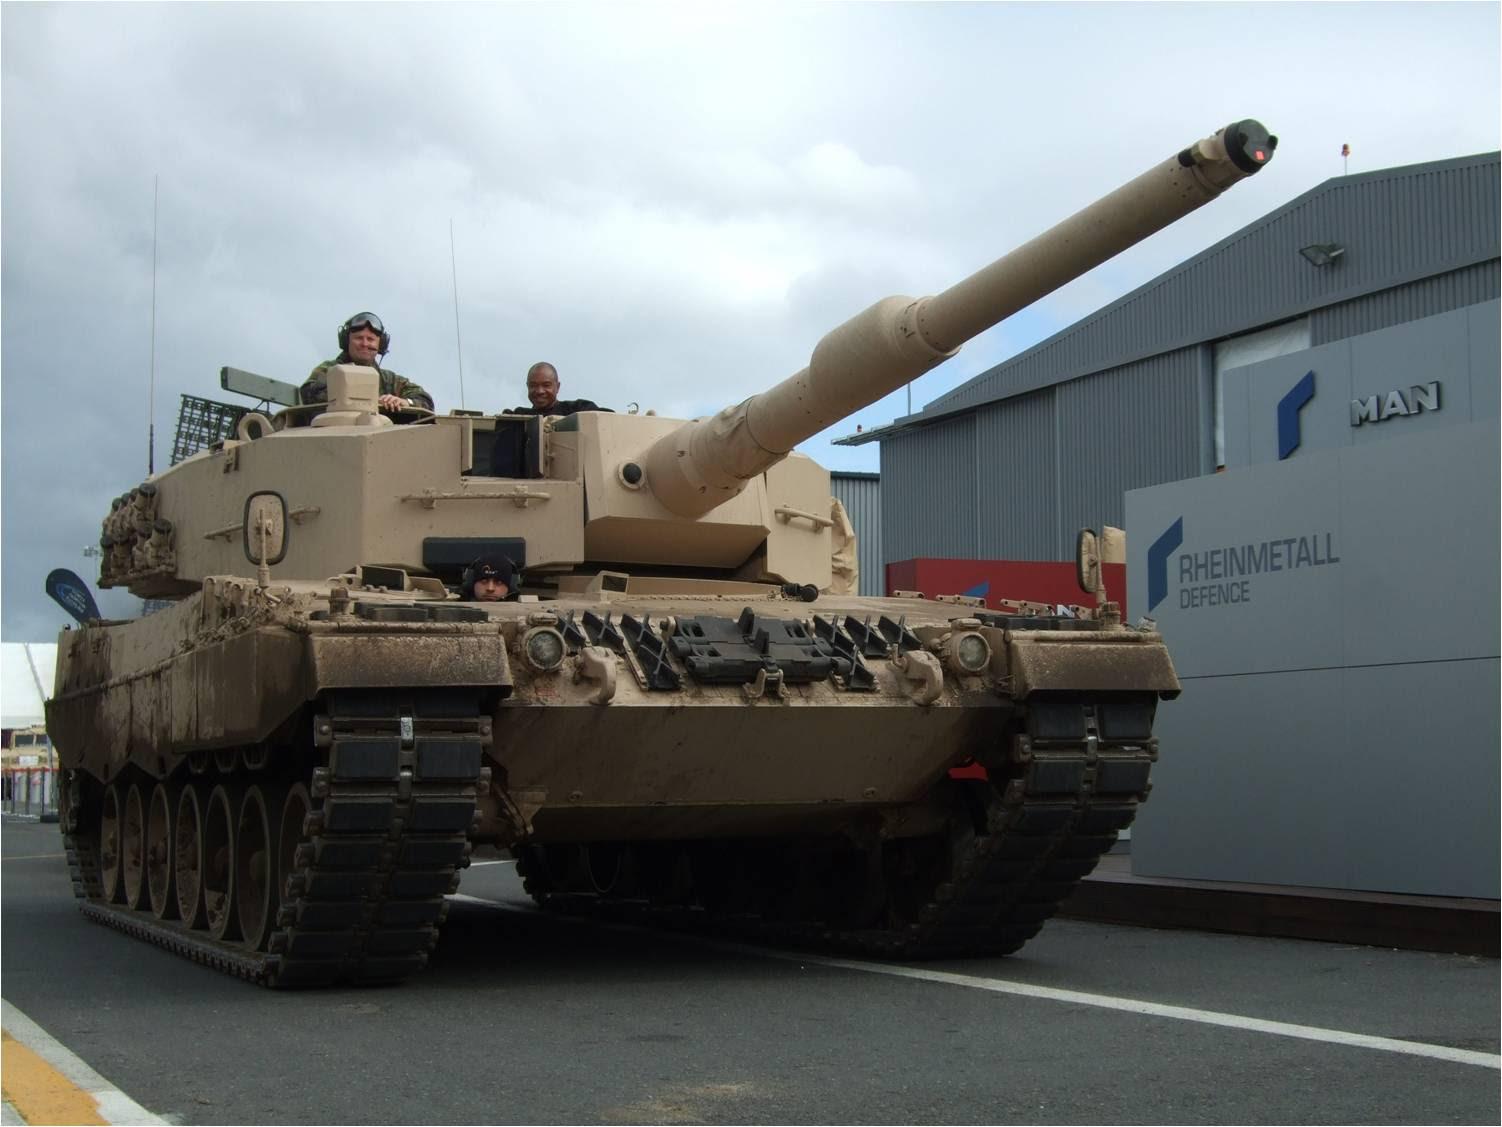 Ternyata tank Leopard tidak merusak jalan...